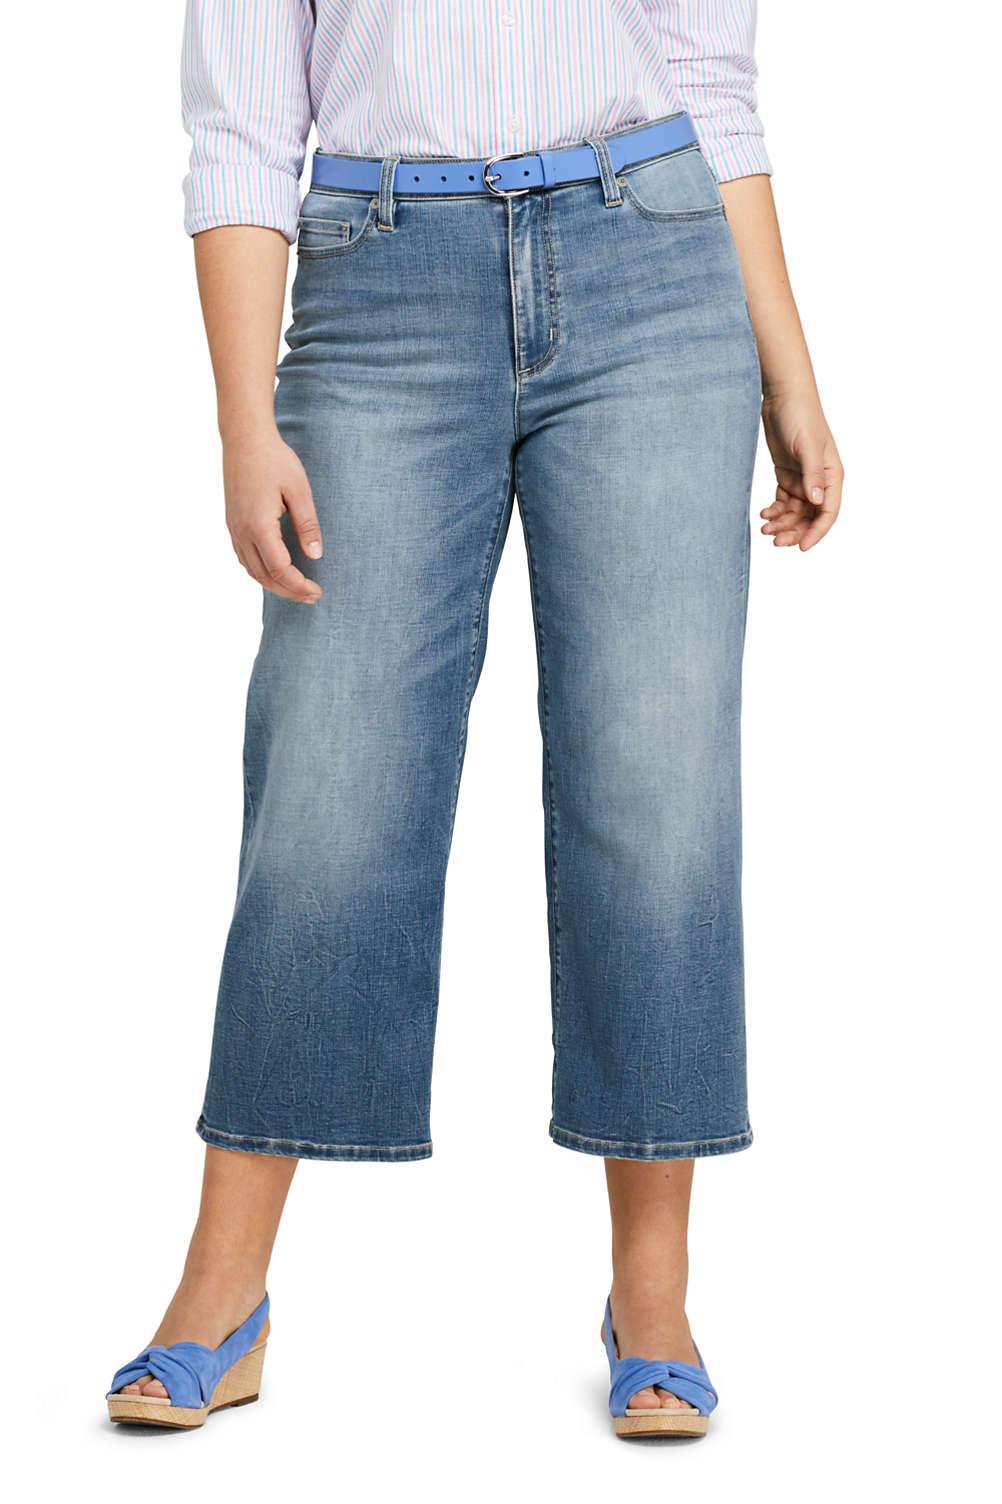 5435a2ead93 Women s Plus Size Mid Rise Wide Leg Crop Jeans from Lands  End